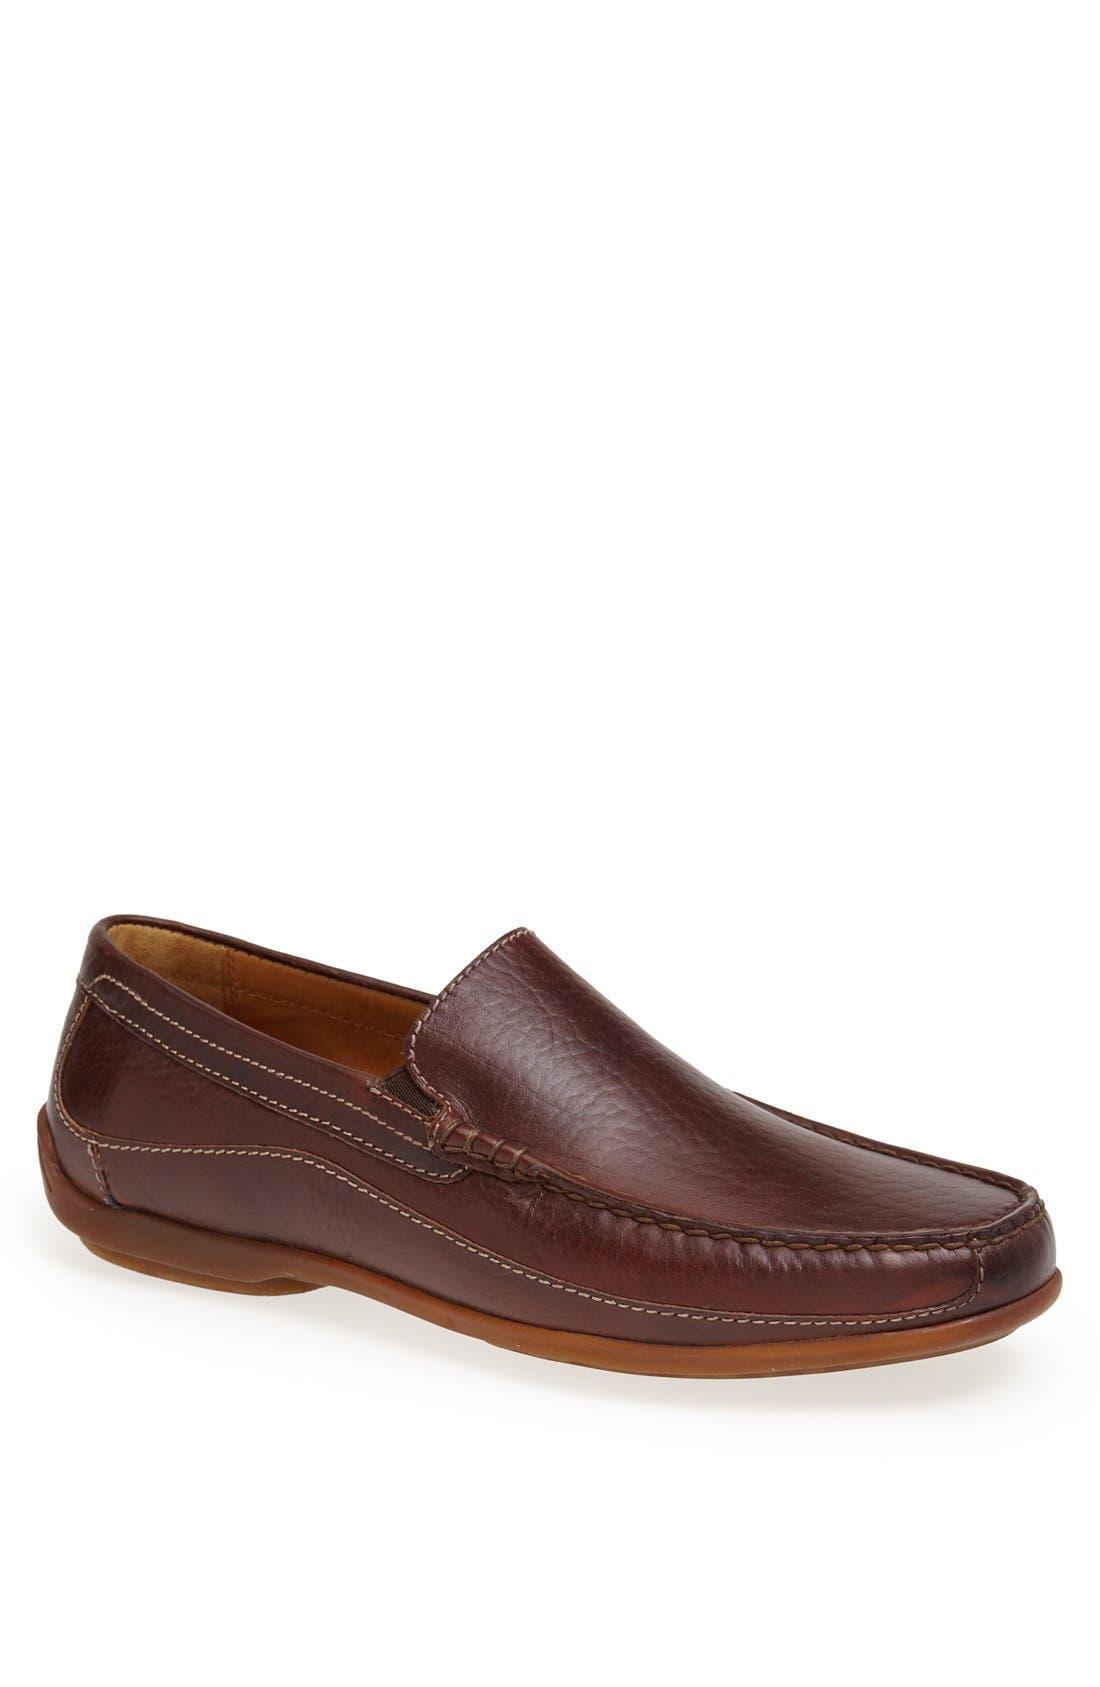 TRASK 'Declan' Moc Toe Venetian Slip-On, Main, color, BOURBON AMERICAN BISON